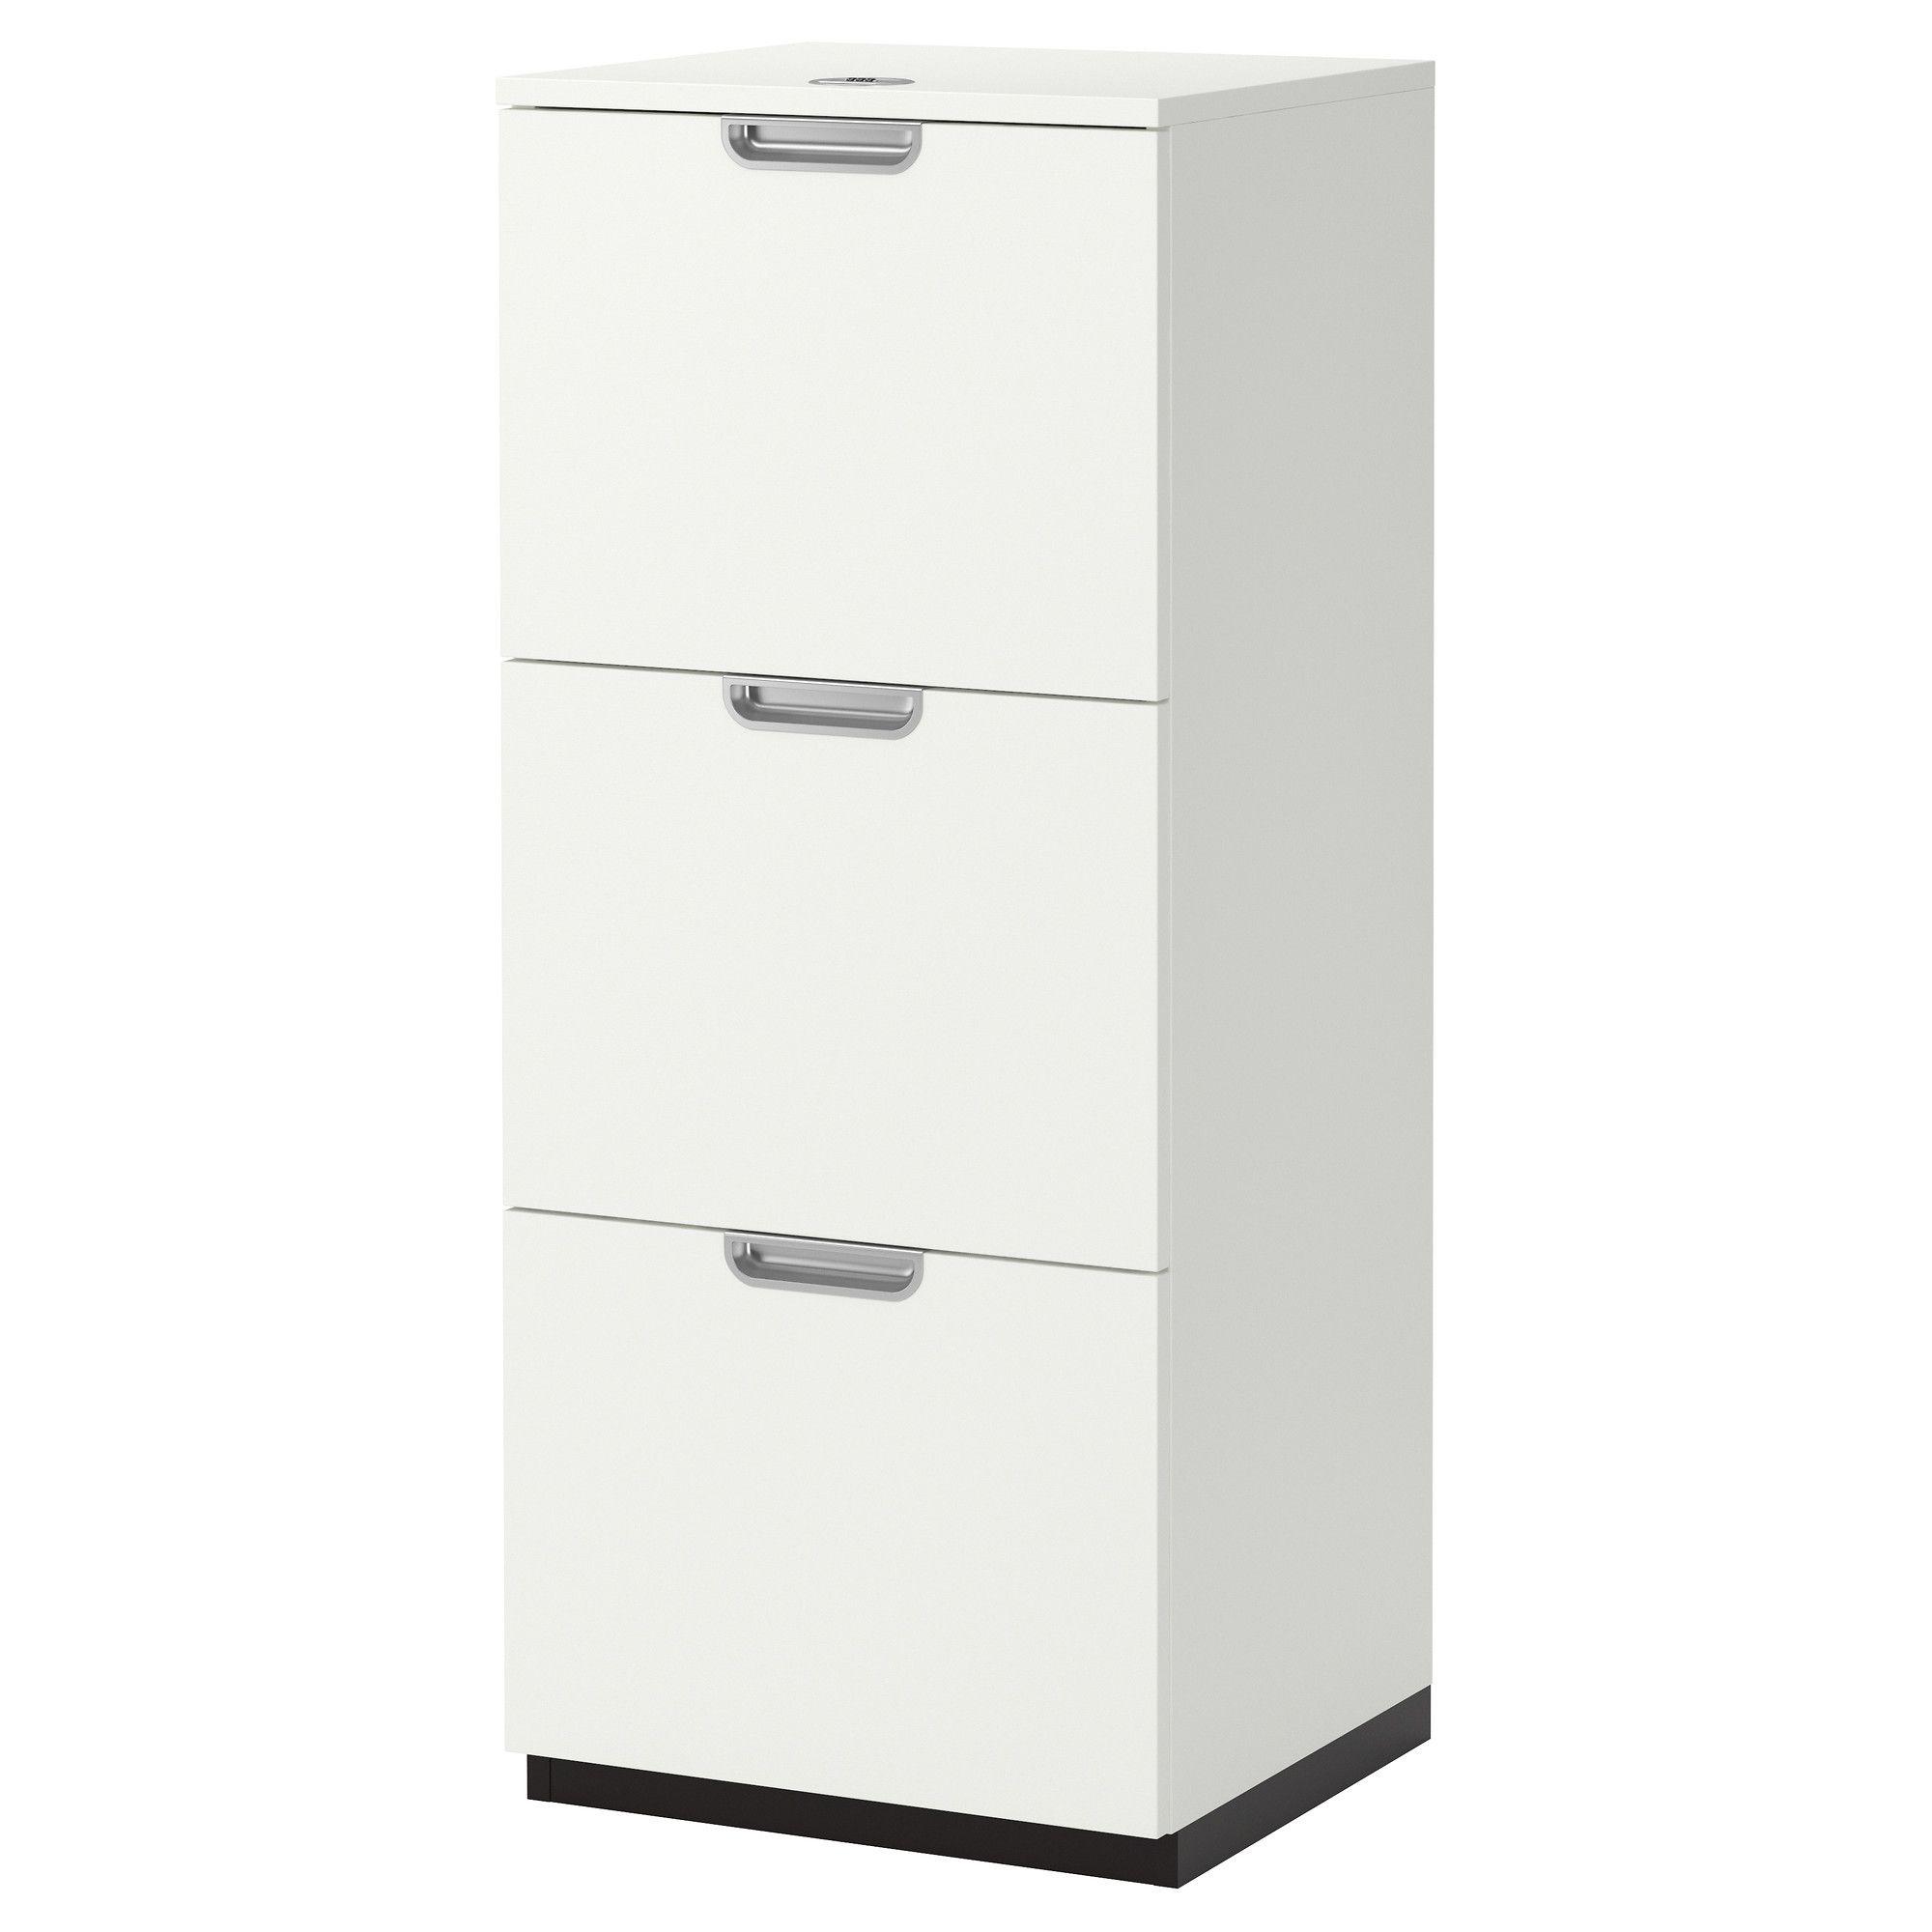 Ikea Us Furniture And Home Furnishings Filing Cabinet Ikea Storage Cabinets Ikea Galant